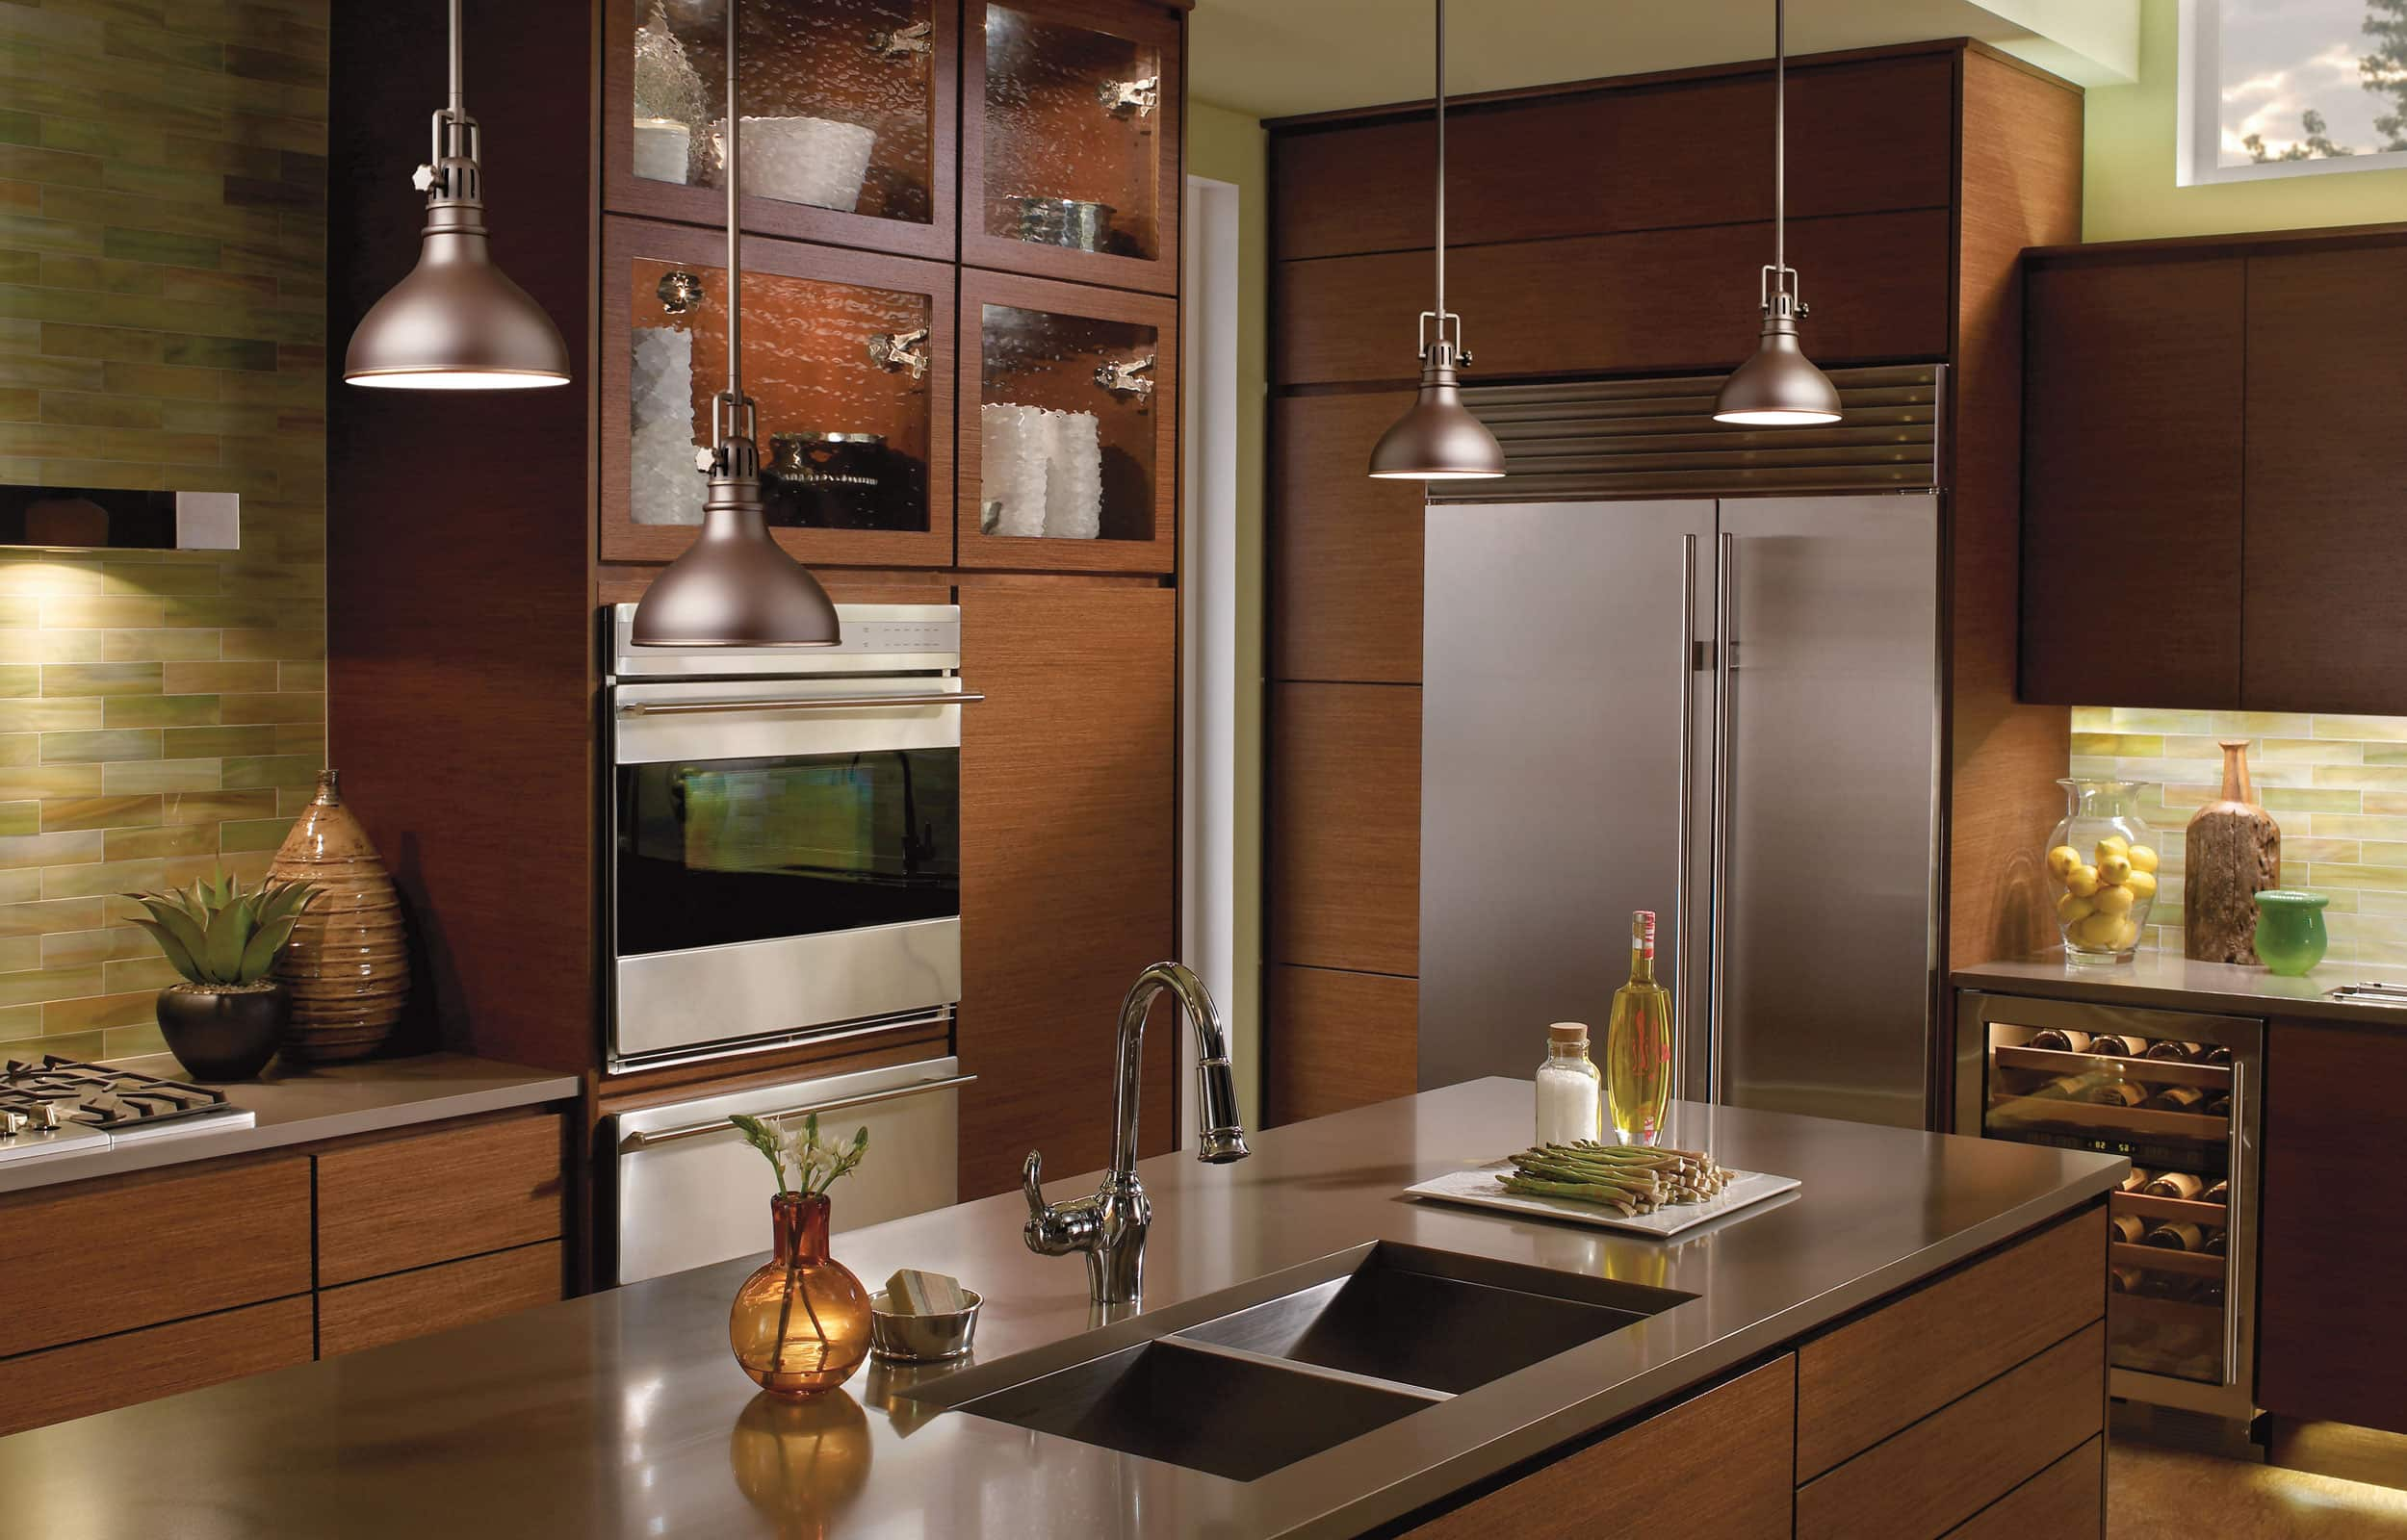 Kitchen Lighting Pics 29 Inspiring Kitchen Lighting Ideas Designbump